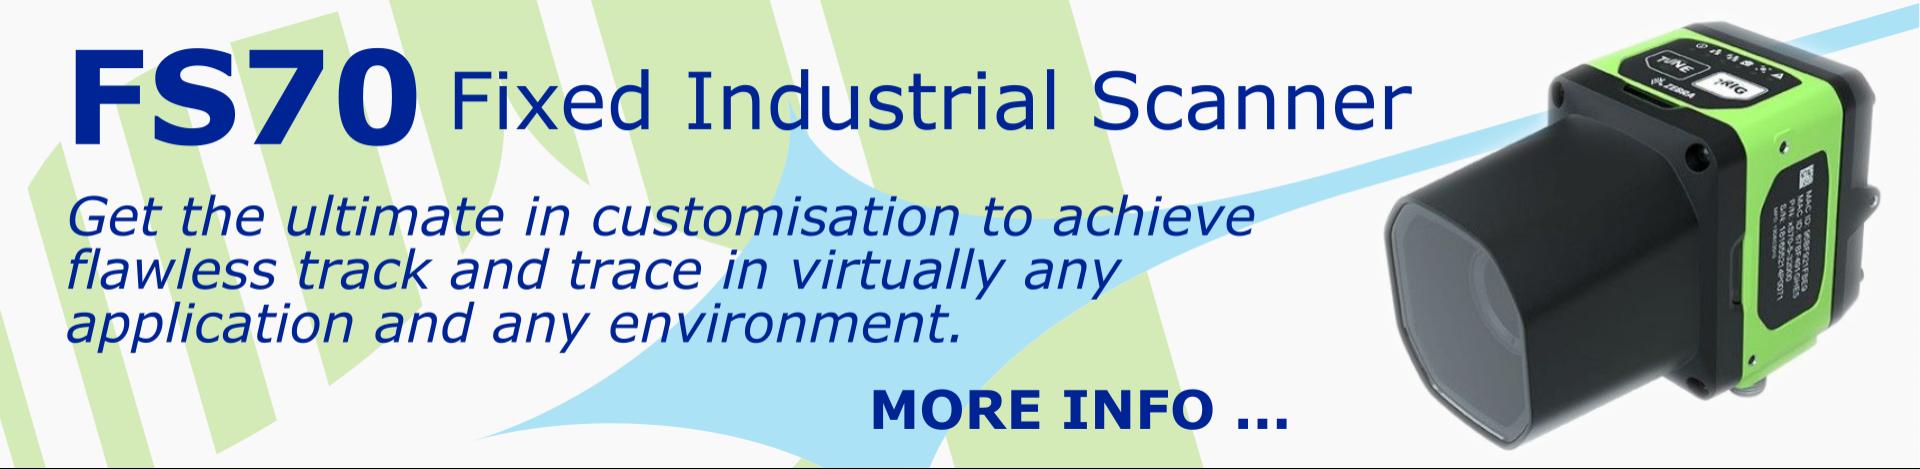 FS70 Industrial Scanner